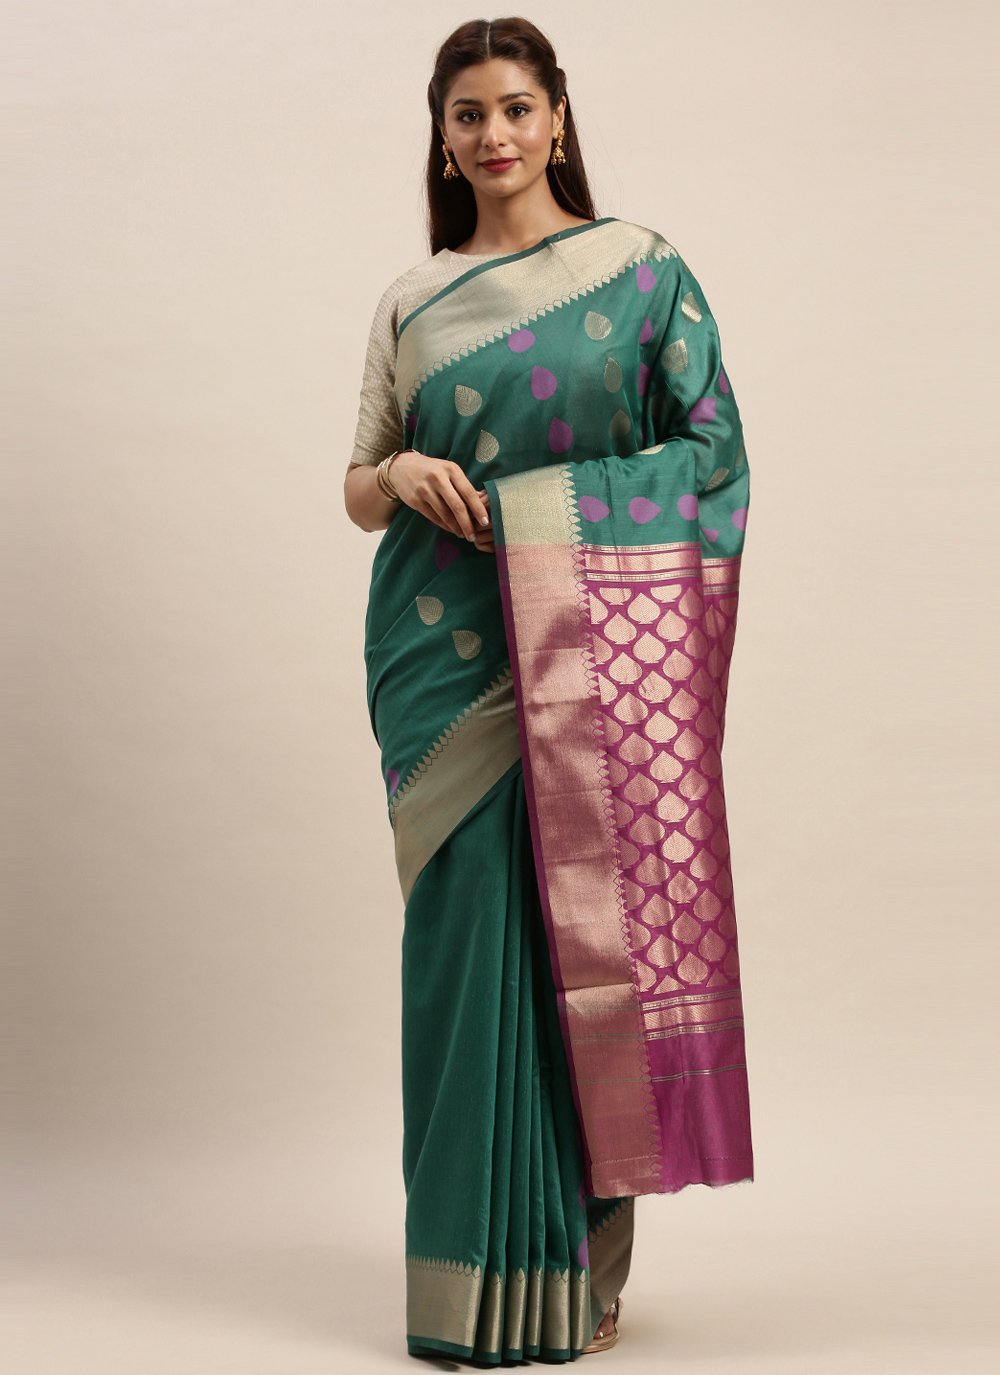 Woven Rama Handloom Cotton Traditional Saree